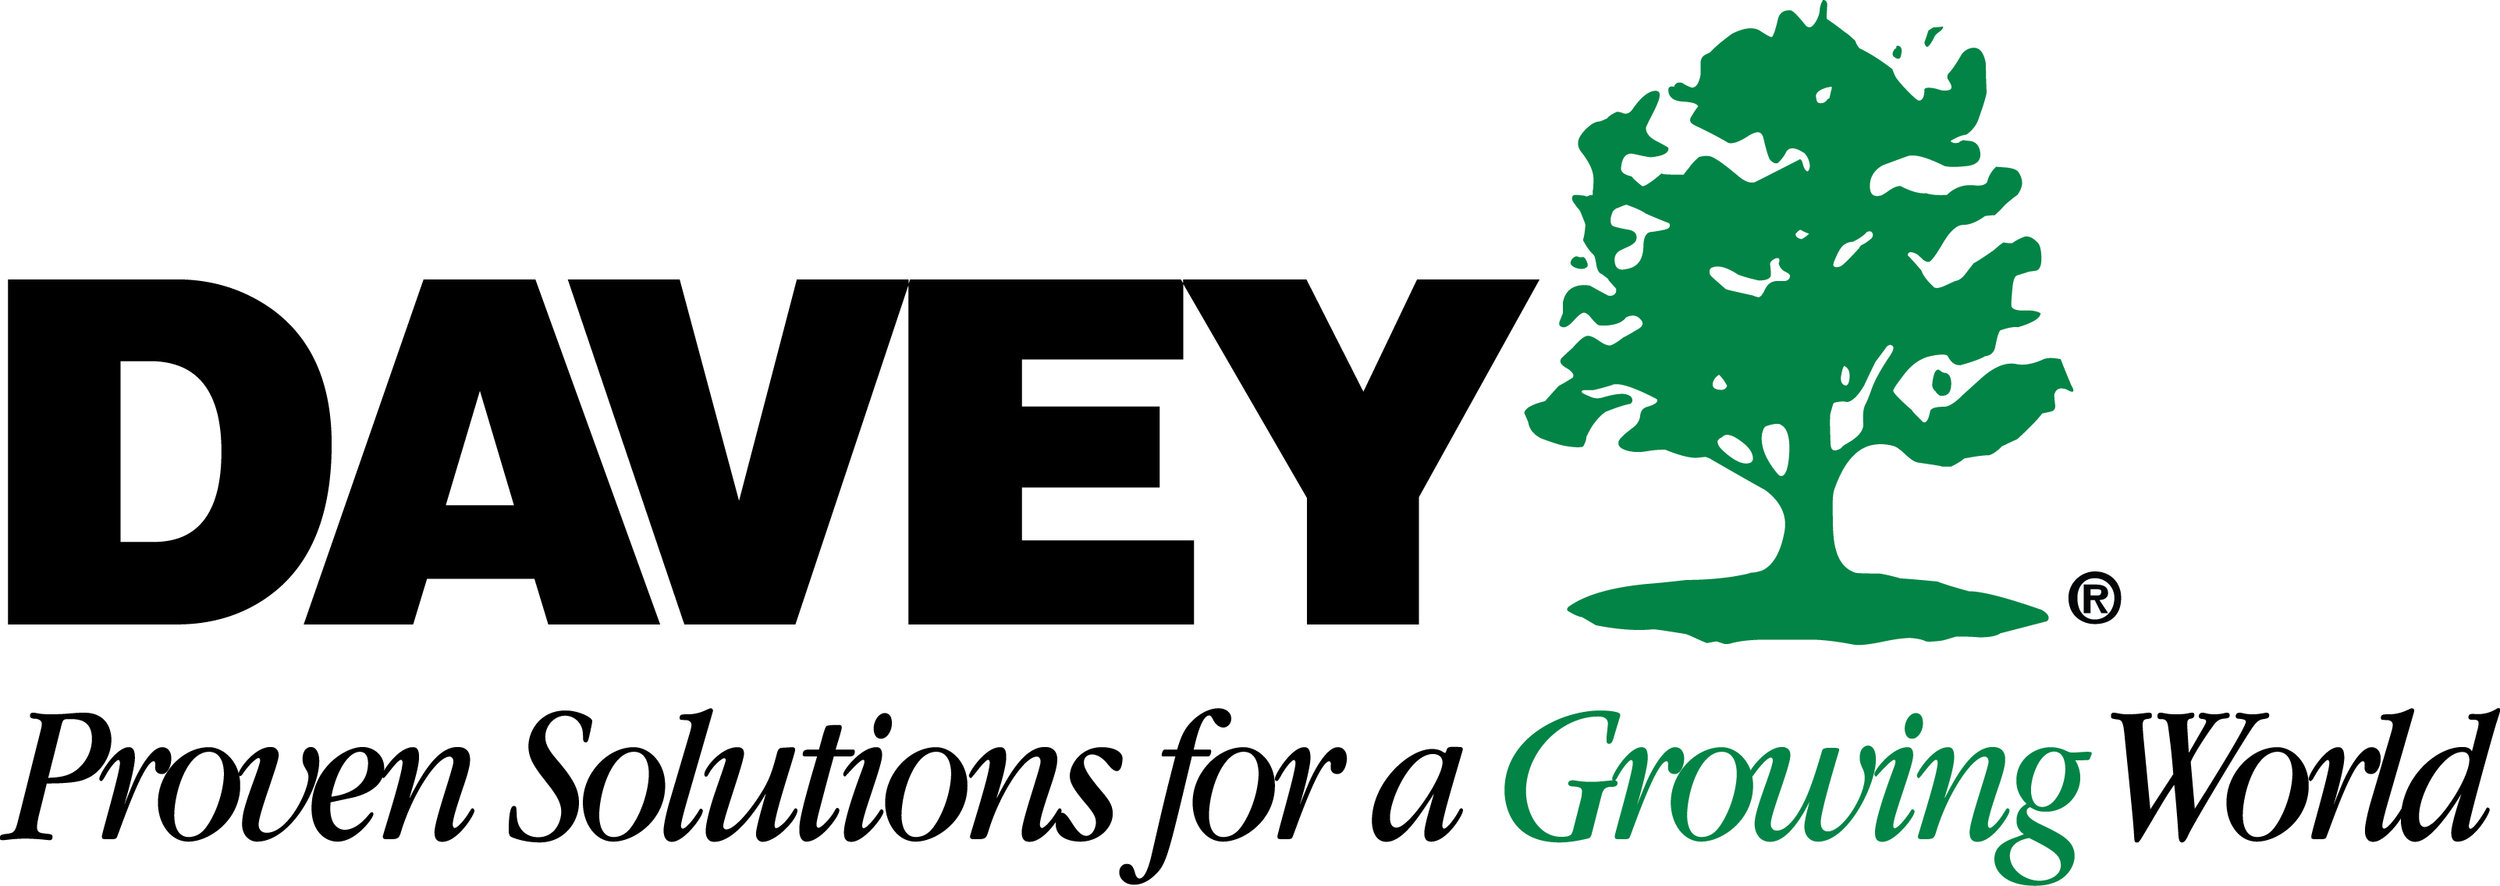 Davey Tree Logo.jpg